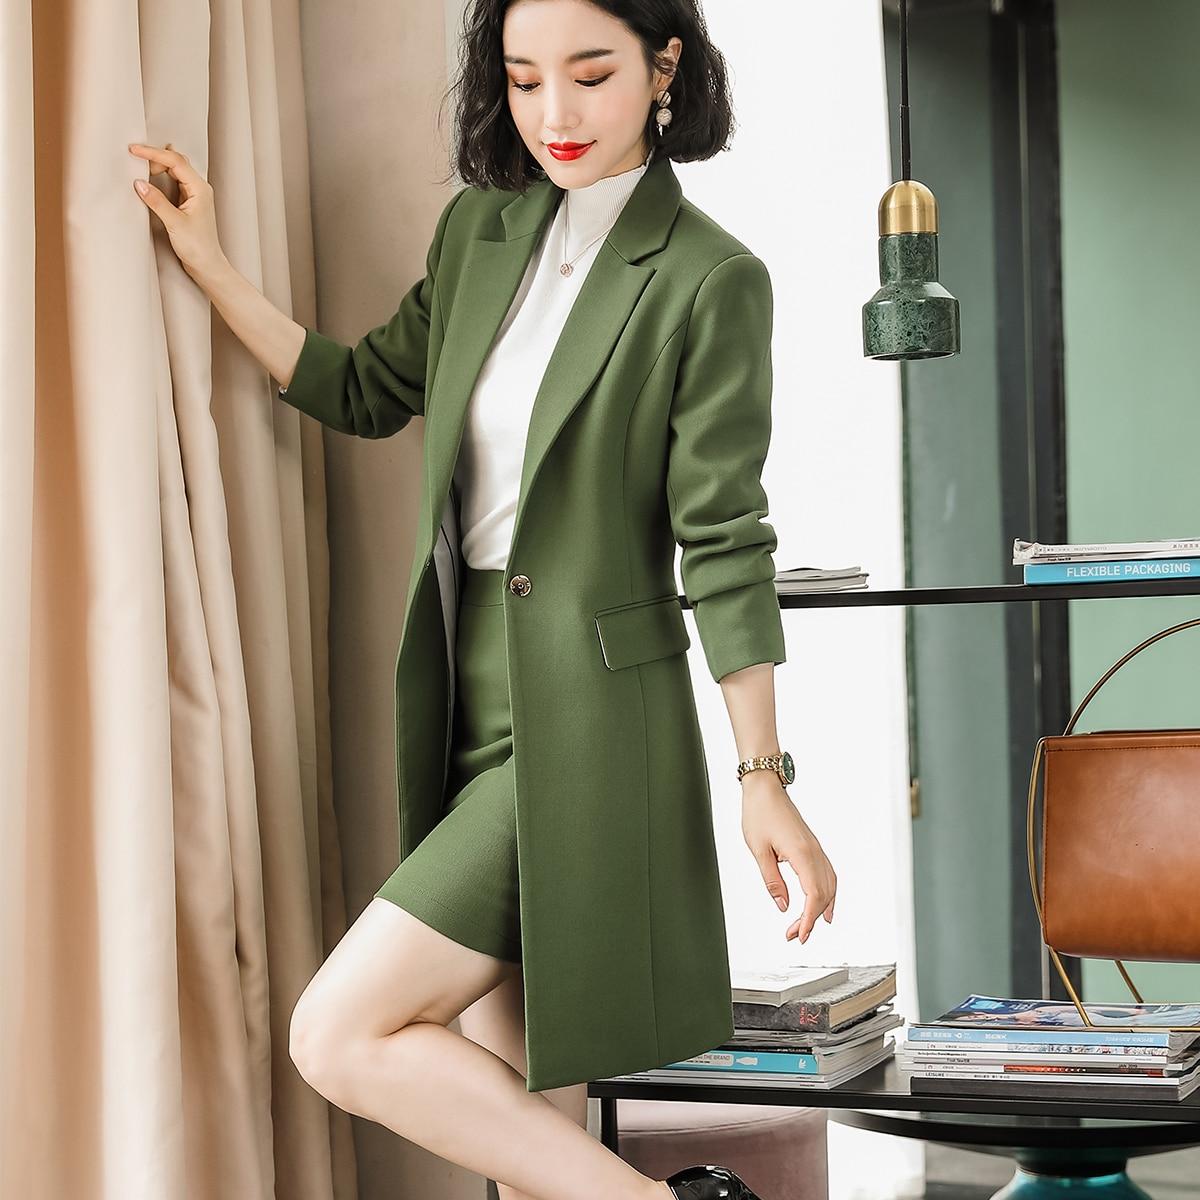 Female Elegant Formal Fall Winter Women Long Blazer Elegant Long Sleeve Formal Jacket Green Red Yellow Apricot Blue CoatClothing